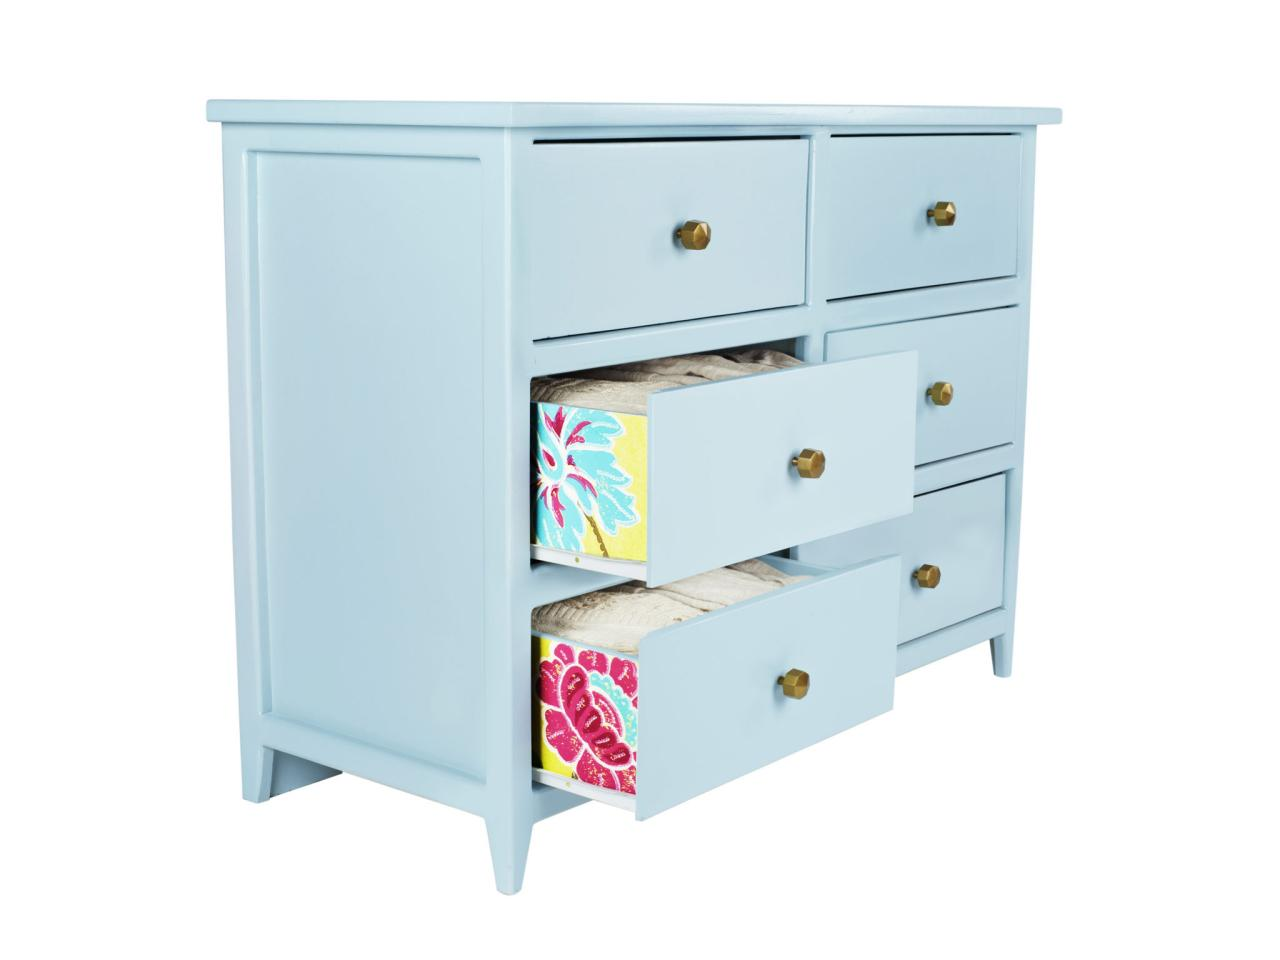 How to Wallpaper Interior Dresser Drawers HGTV 1280x960